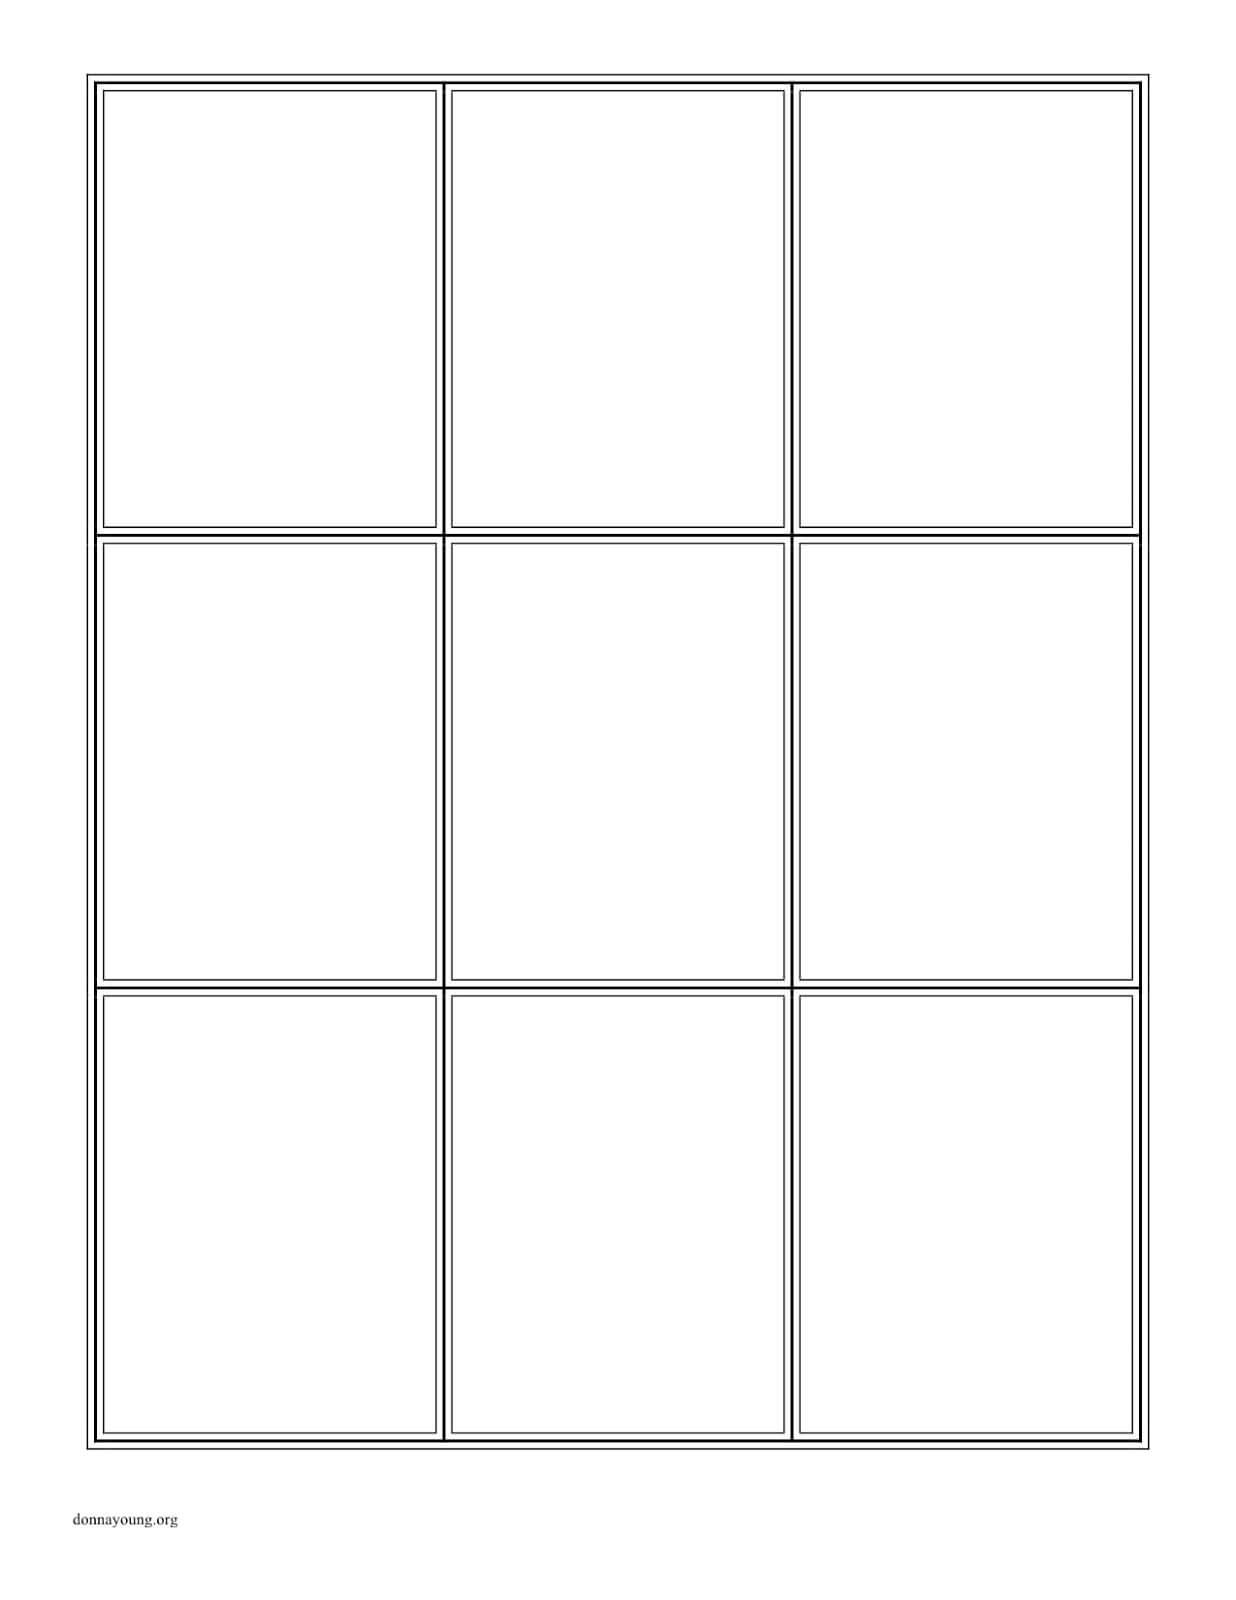 005 Free Trading Card Template Maker Ideas Board Game Blank With Regard To Card Game Template Maker